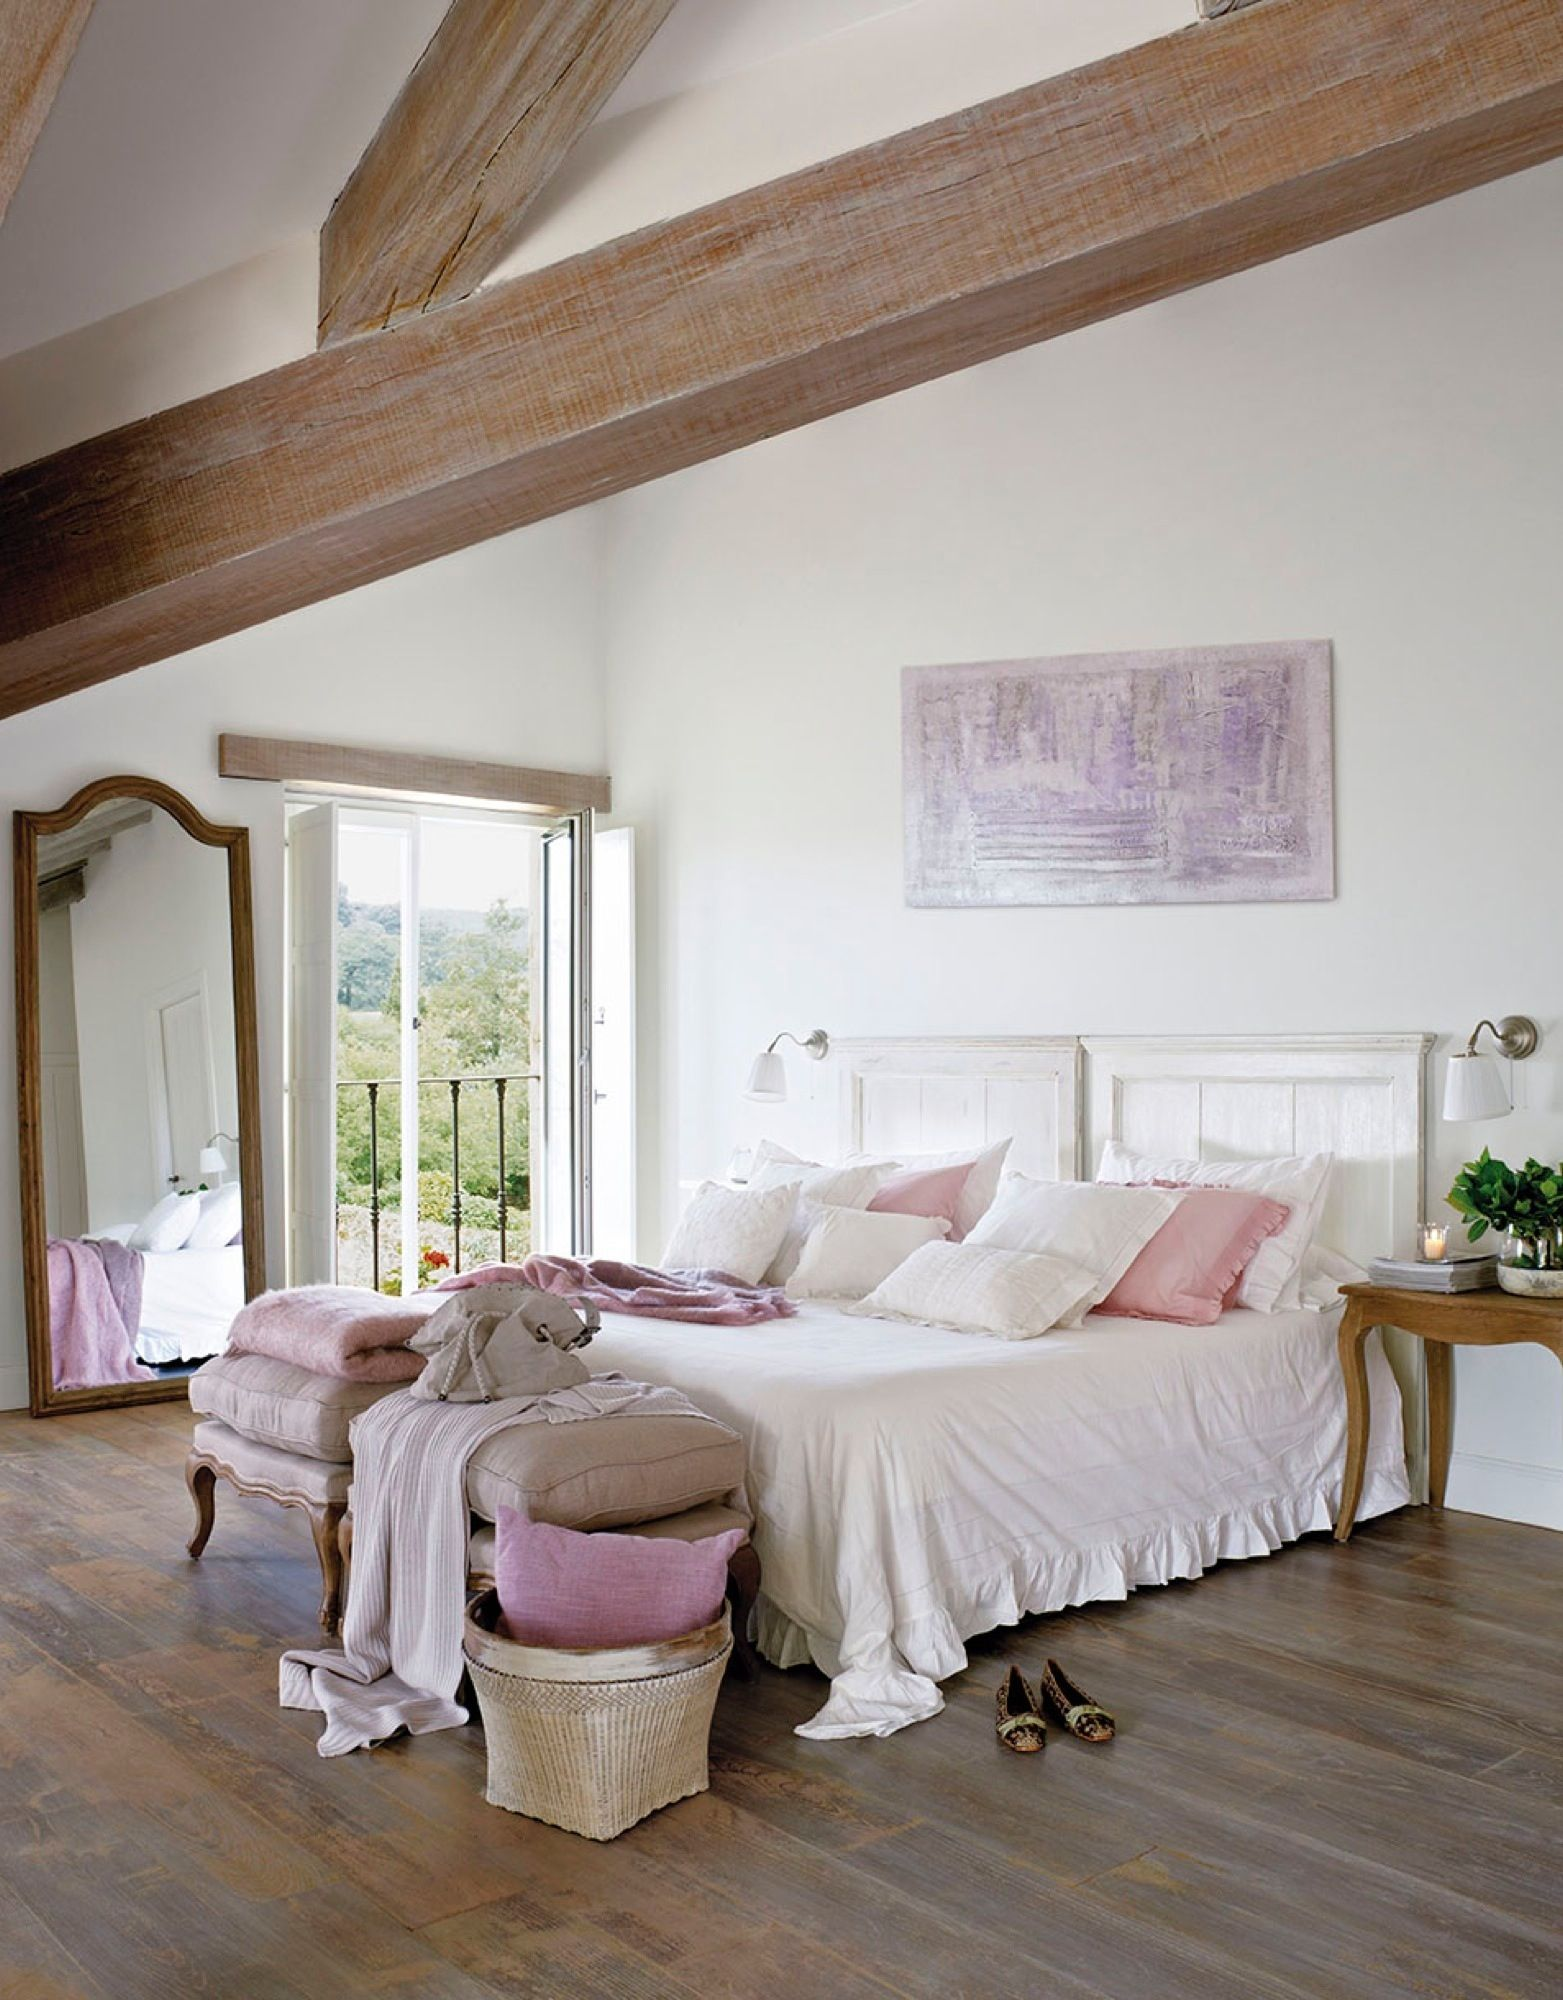 Decorar Dormitorio Rustico Matrimonio : Con balcón decoración. dormitorios rústicos dormitorios y